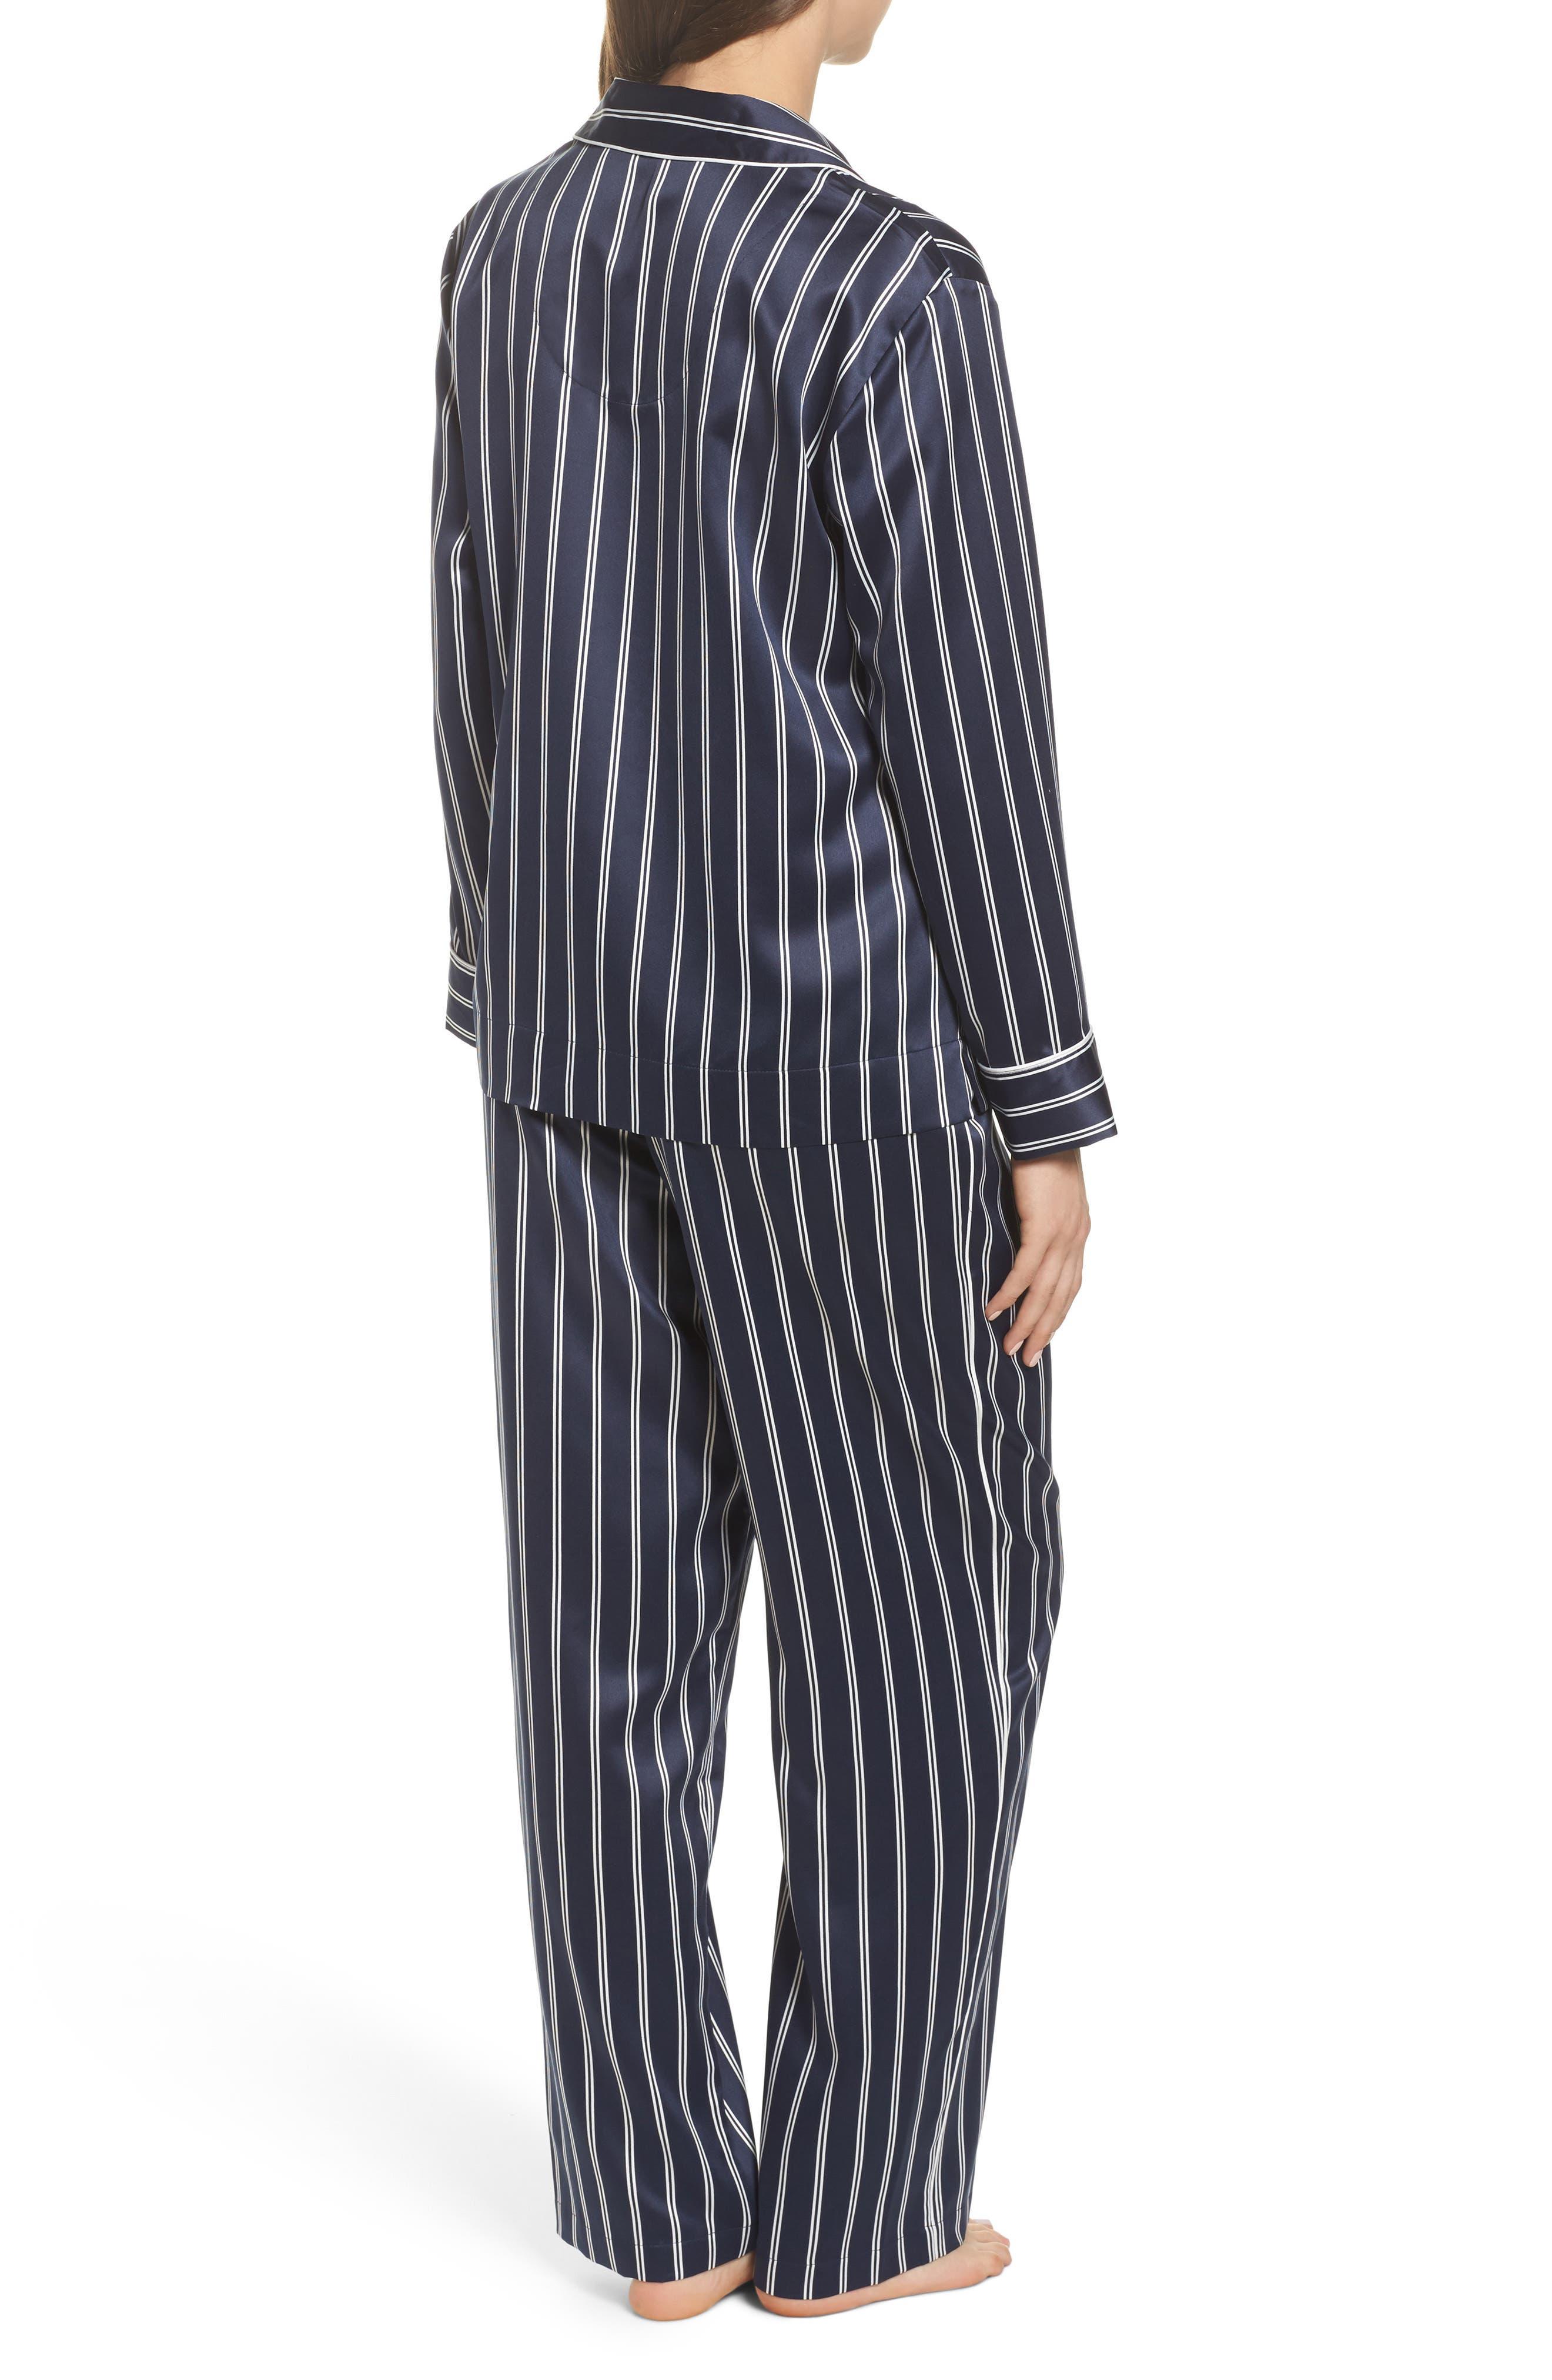 Satin Pajamas,                             Alternate thumbnail 2, color,                             Navy Stripe